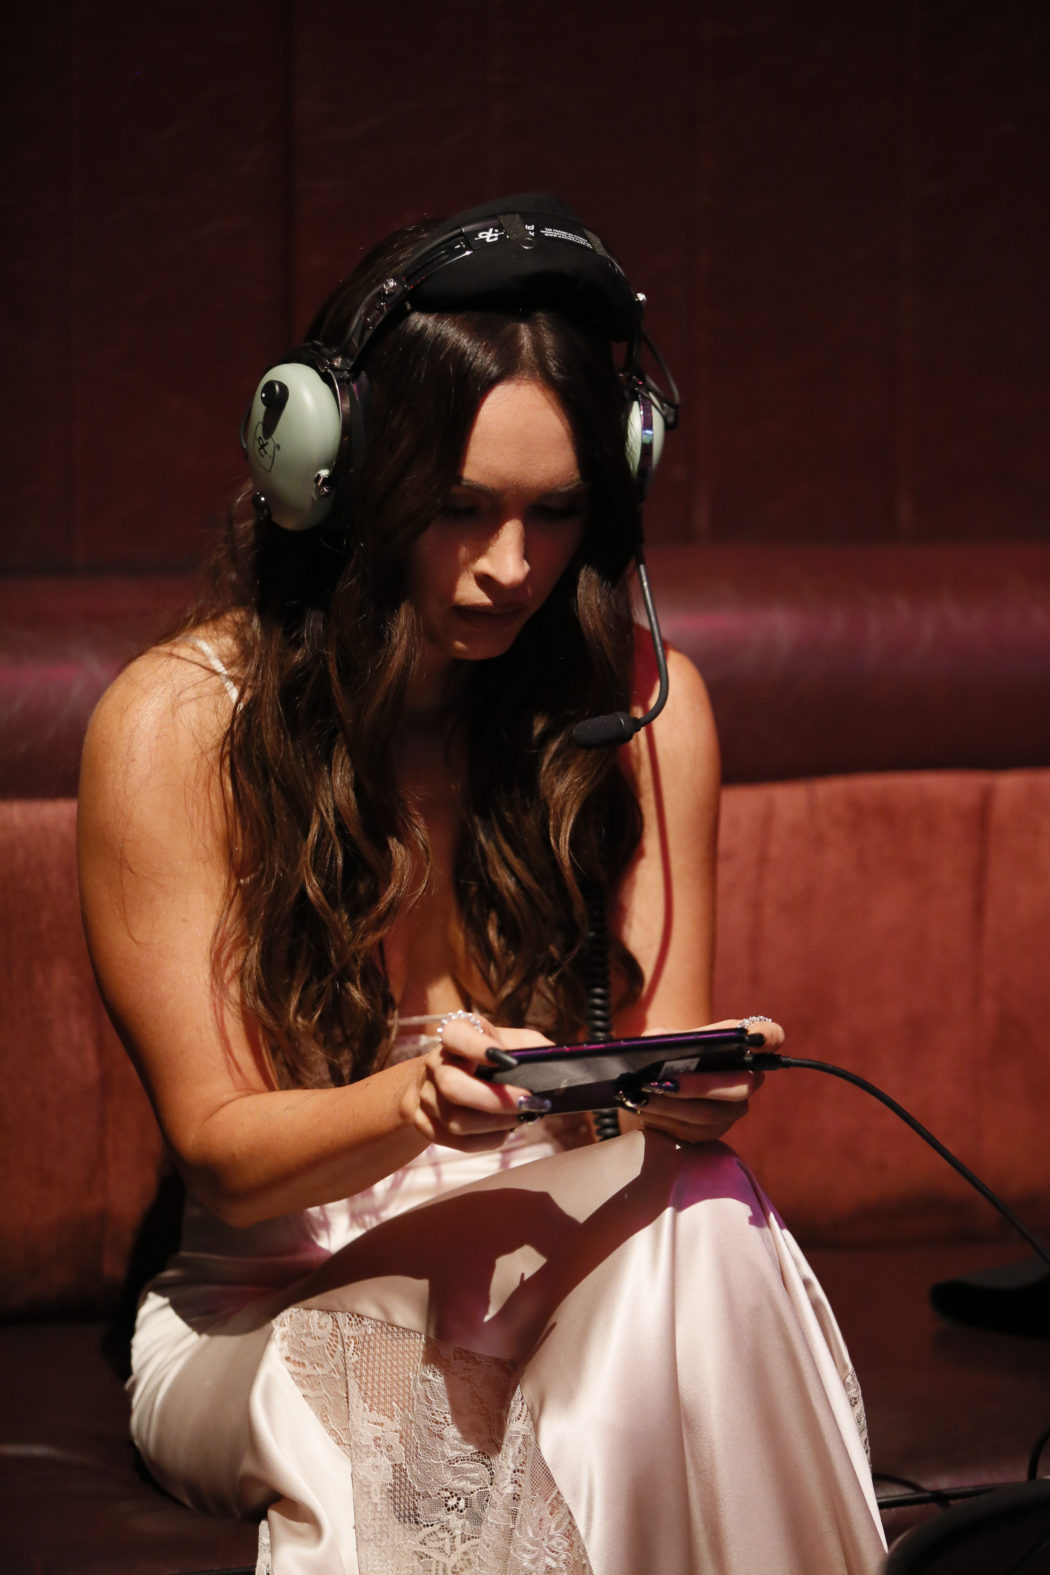 Megan Fox plays in the live PUBG MOBILE celebrity match Ryan Miller